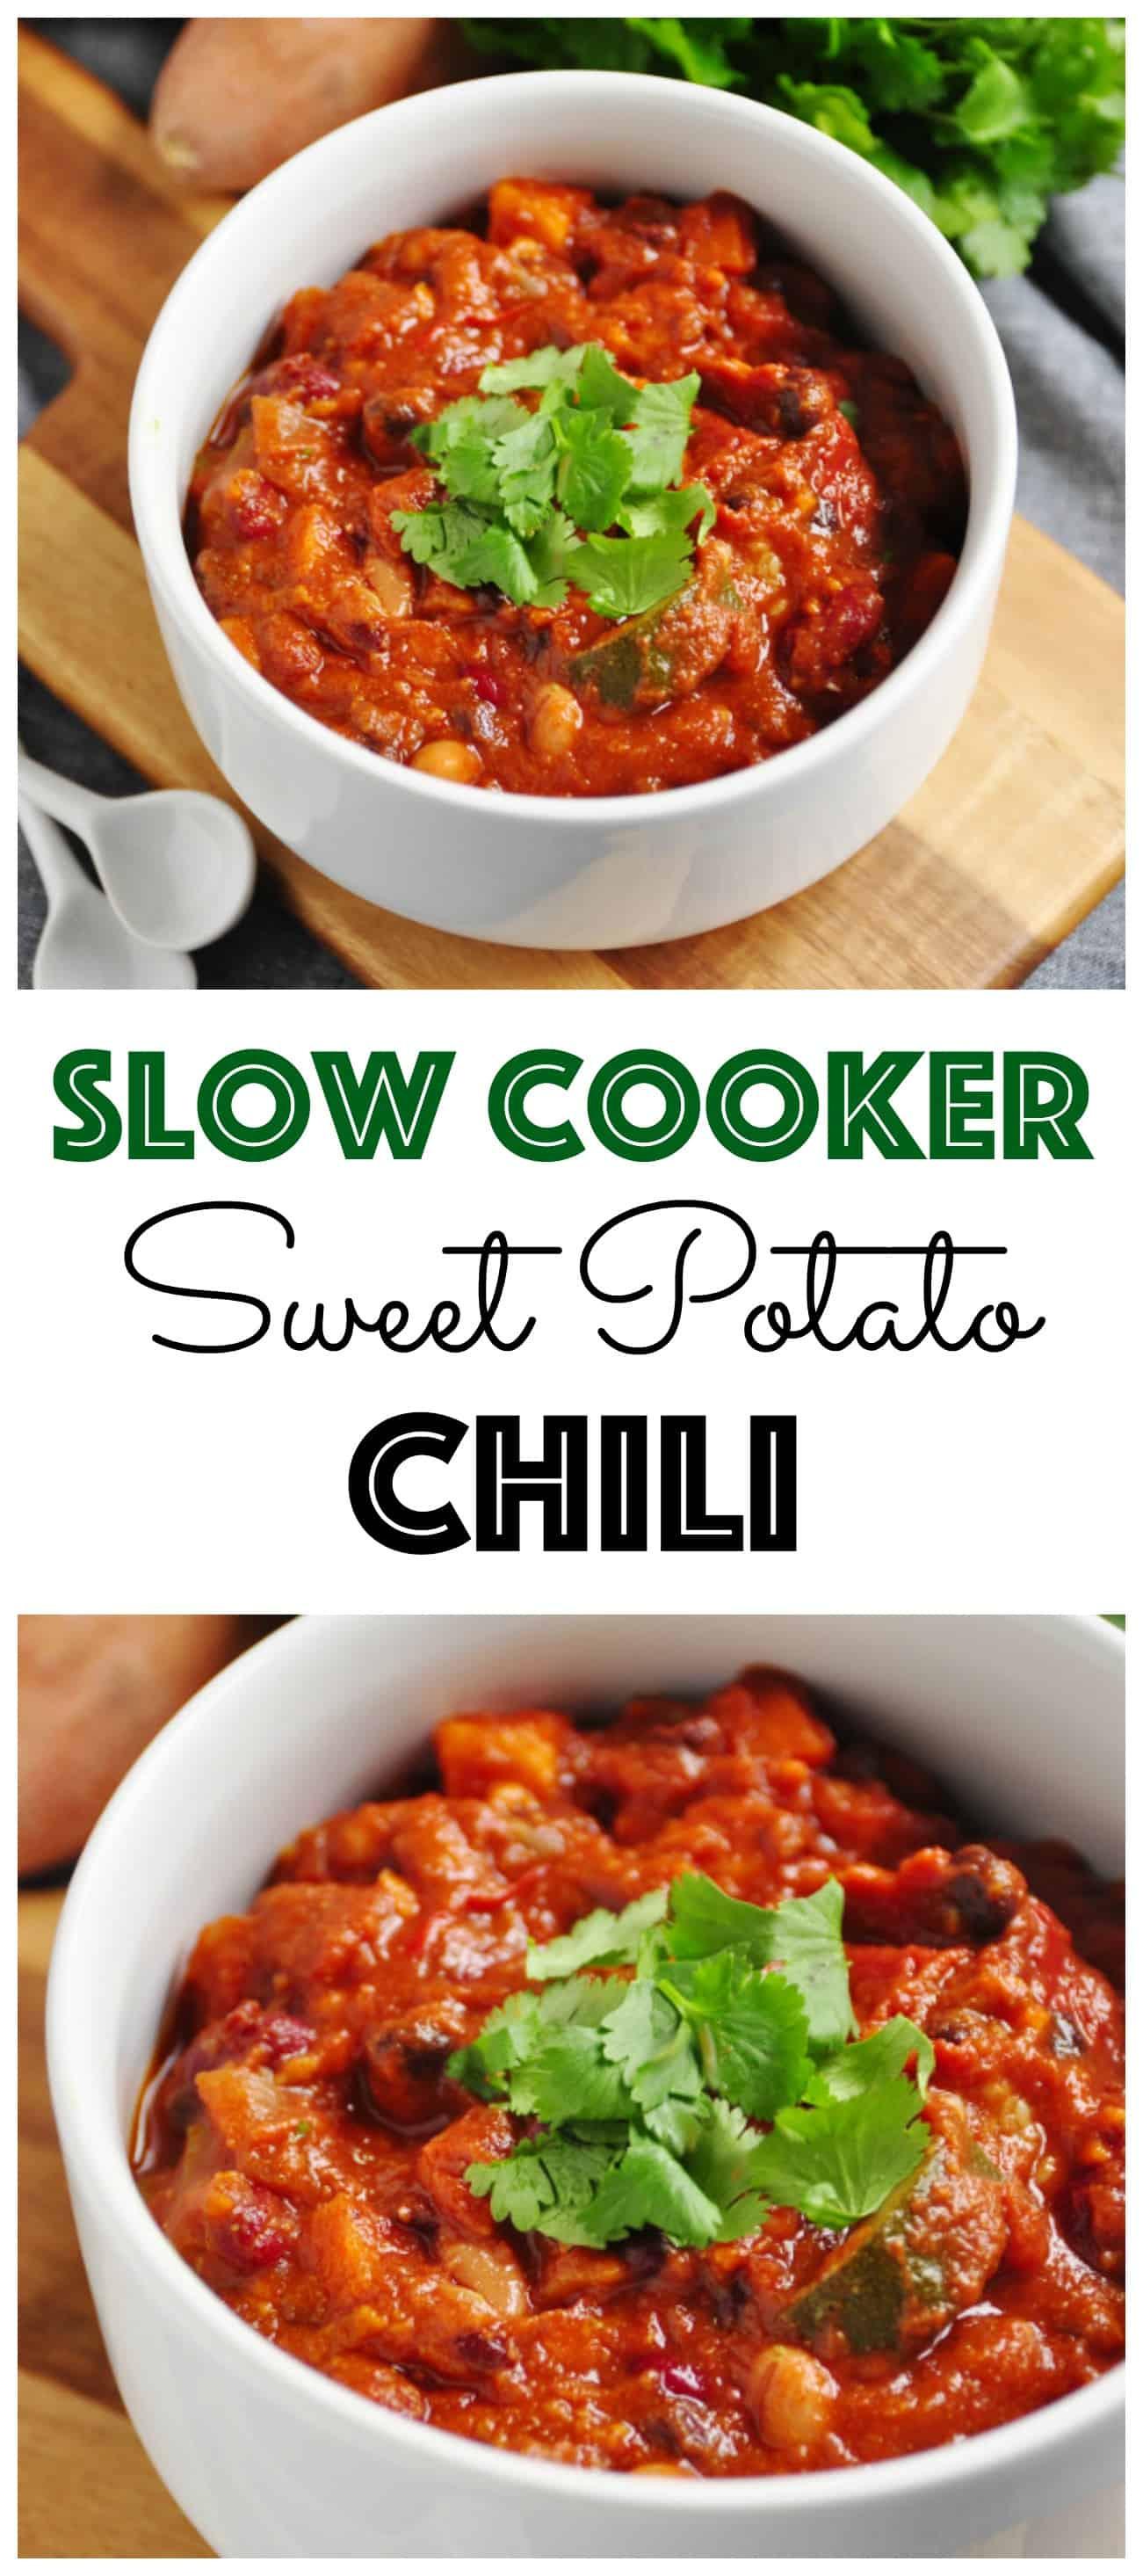 Sweet Potato Chili Slow Cooker  Slow Cooker Sweet Potato Chili Be Whole Be You